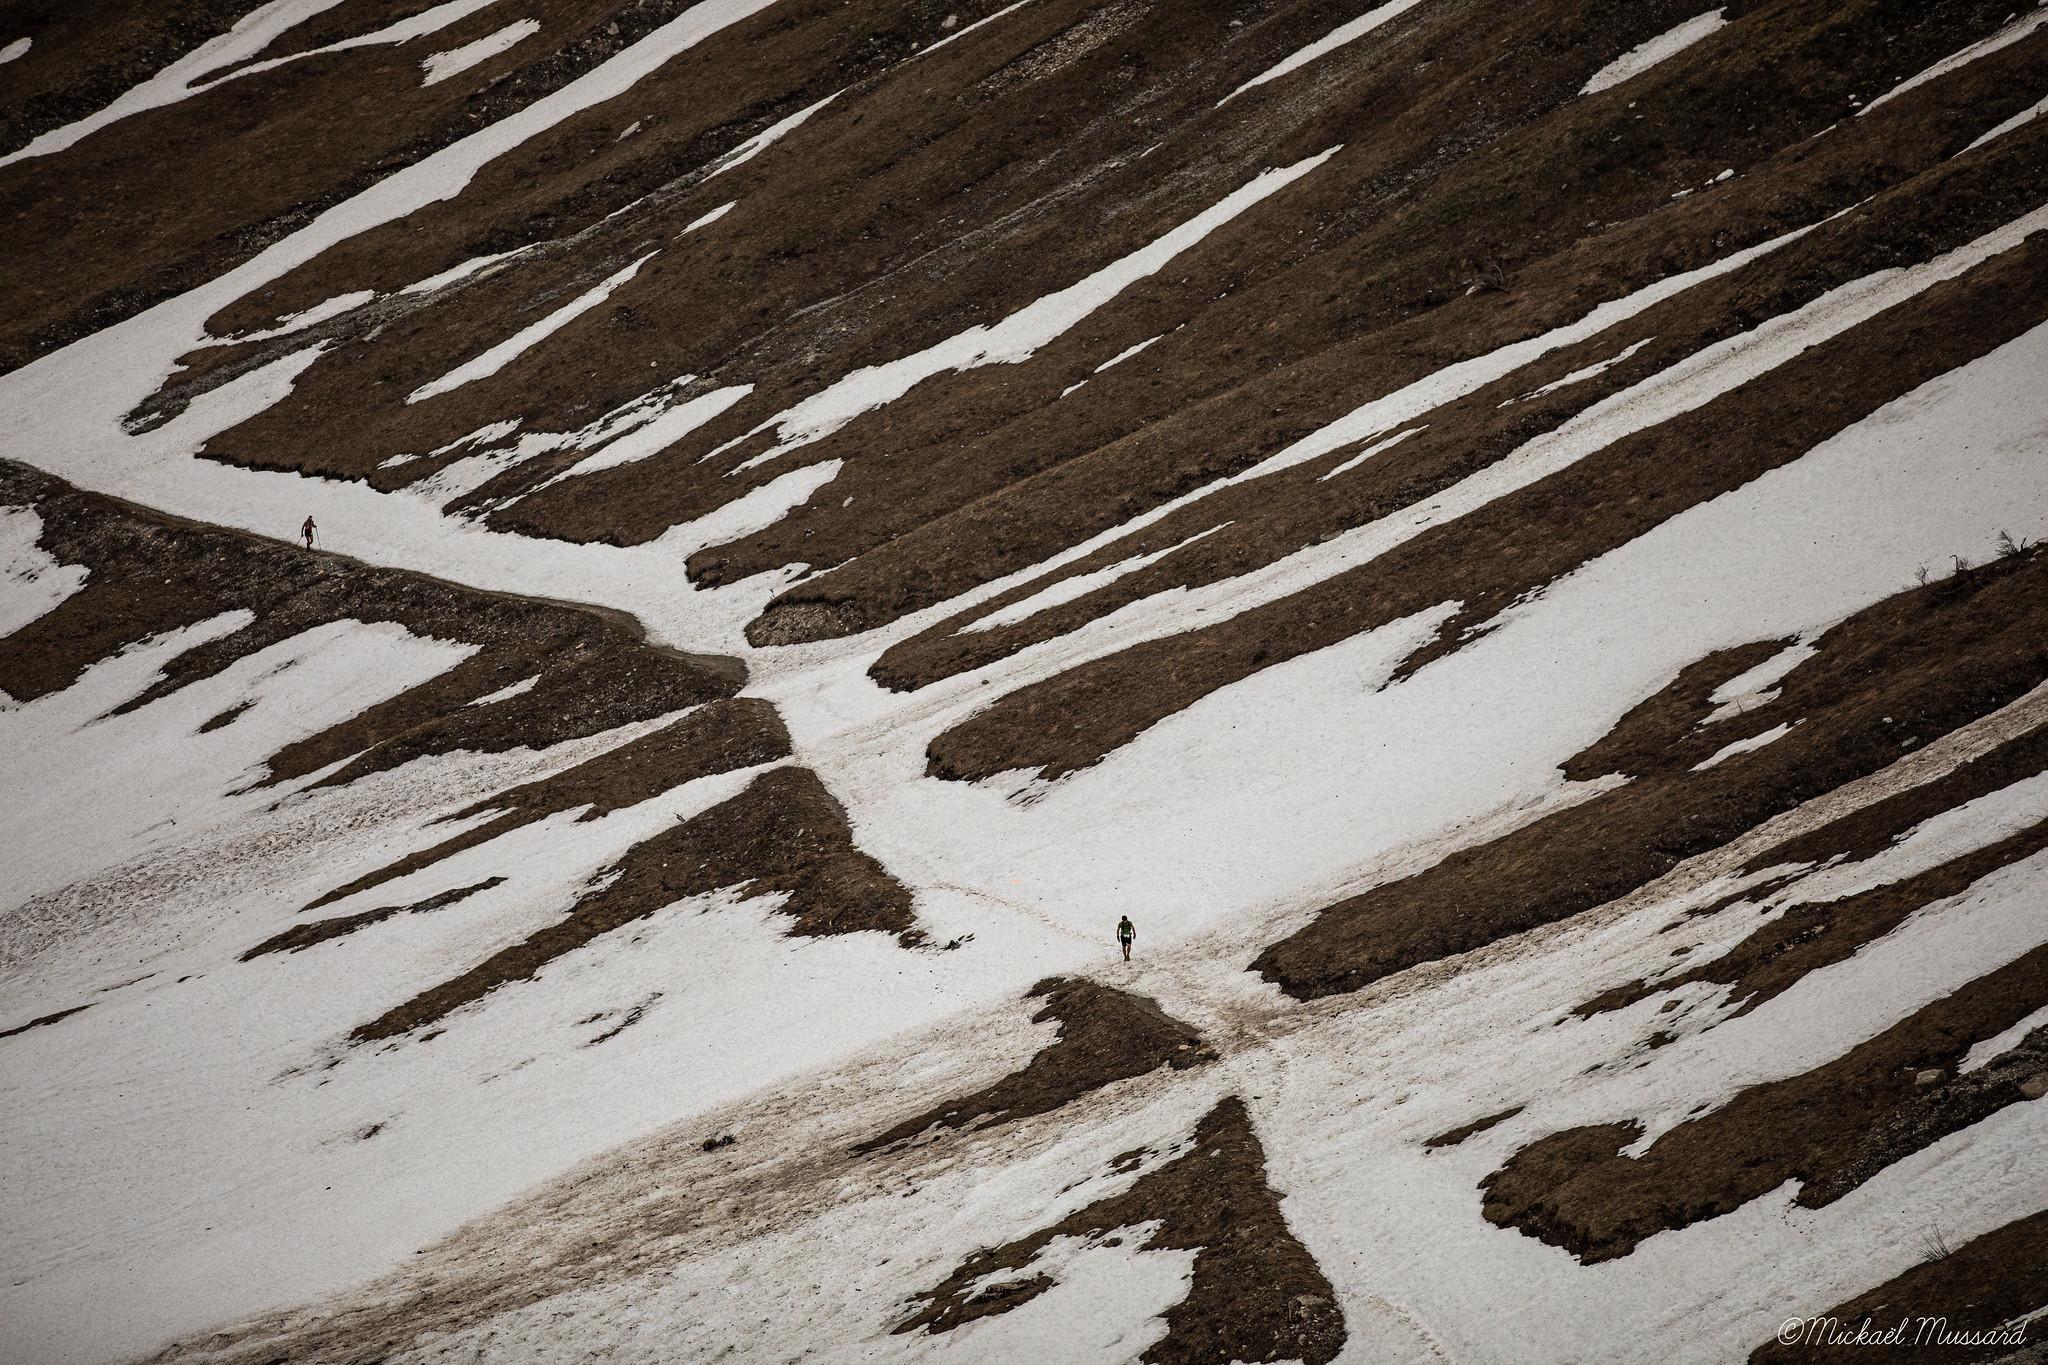 Photo de trail : Maxi-Race dans la neige (c) Mickael Mussard Photographe